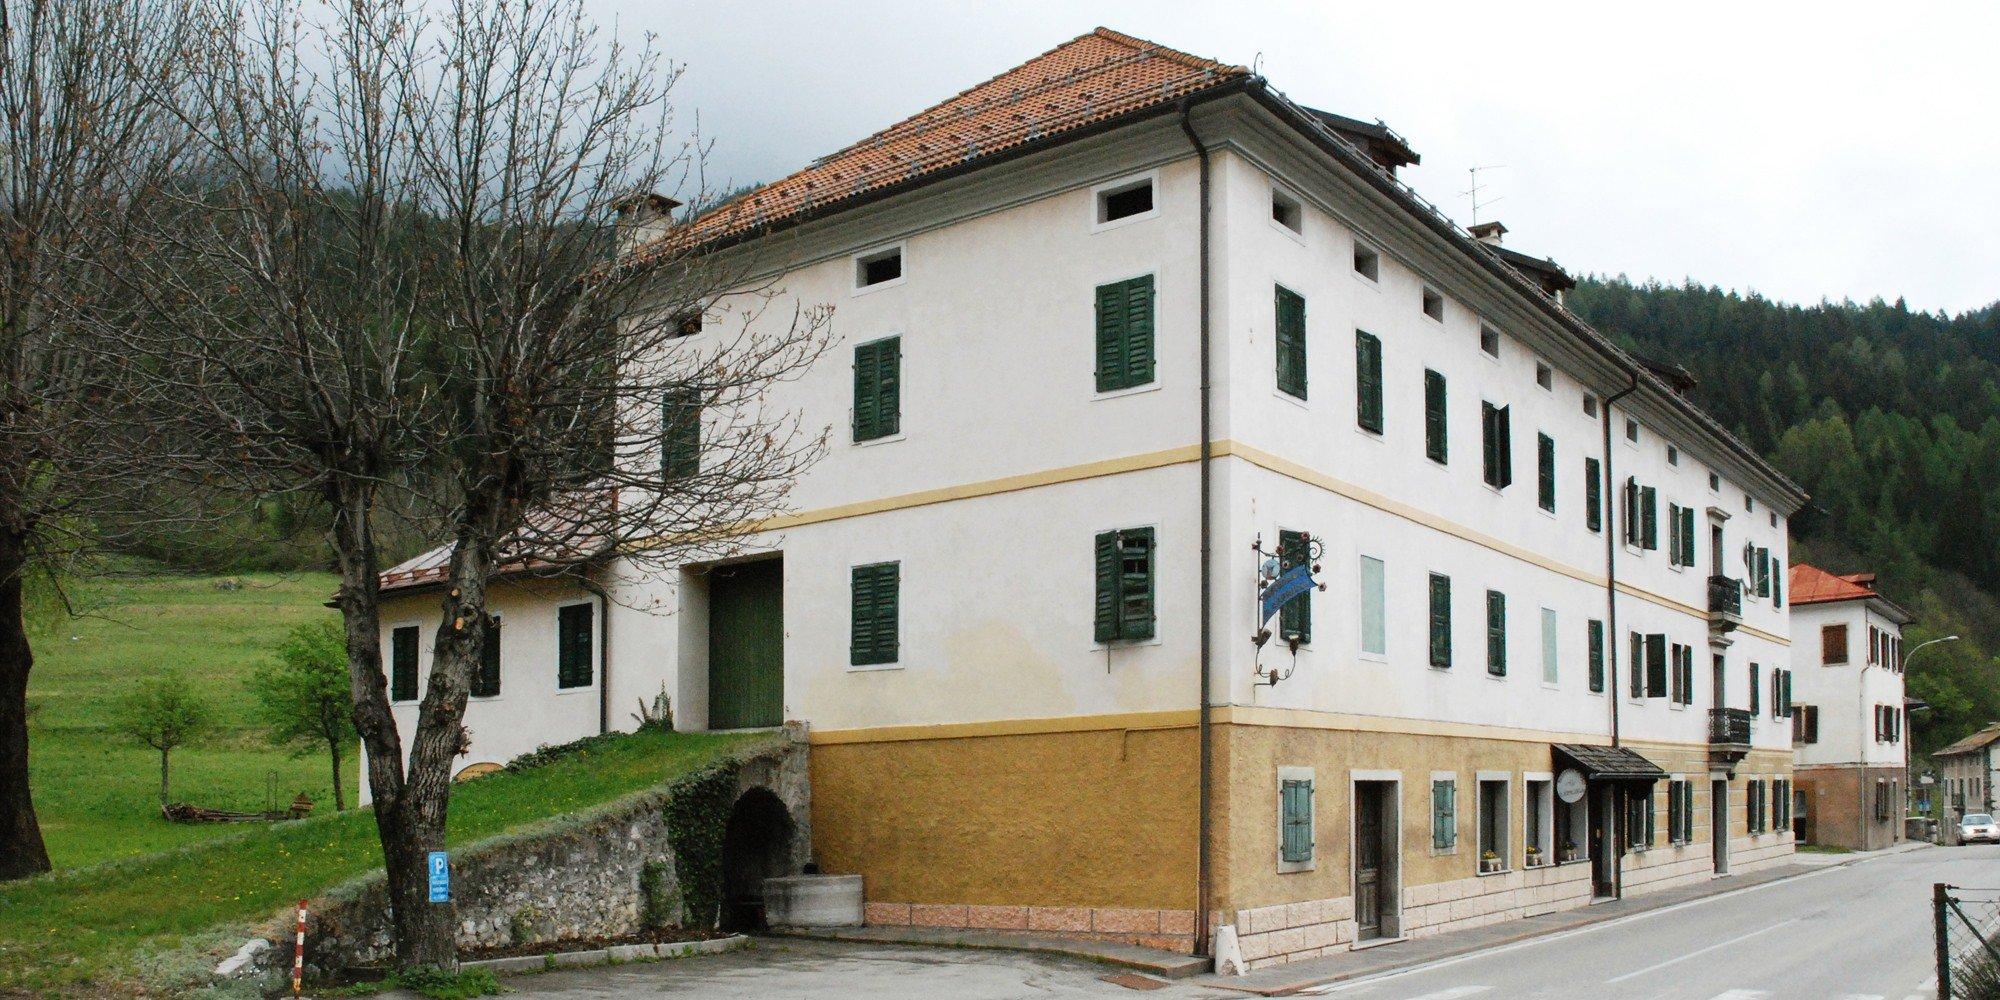 L'edificio esistente del Ristorante / Existing Restaurant Building }